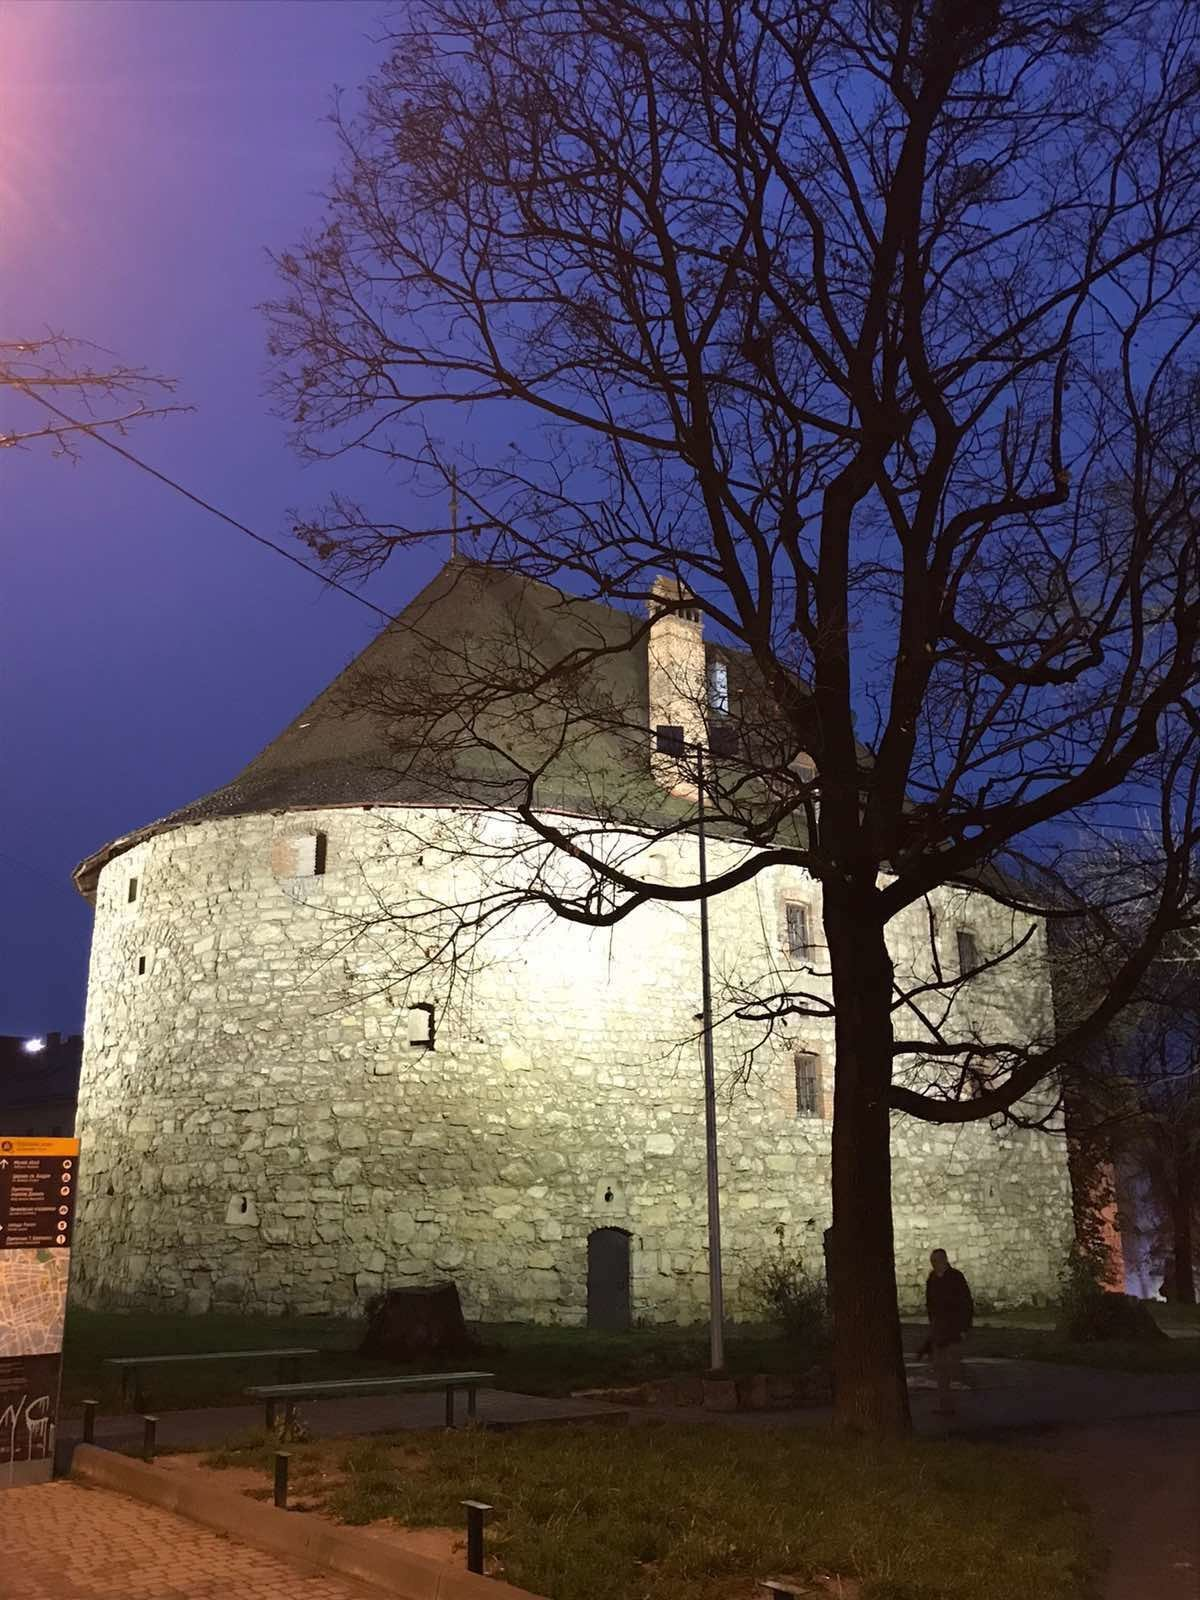 Макет історичного Львова, Порохова вежа, фото 032.ua, Богдан Гой